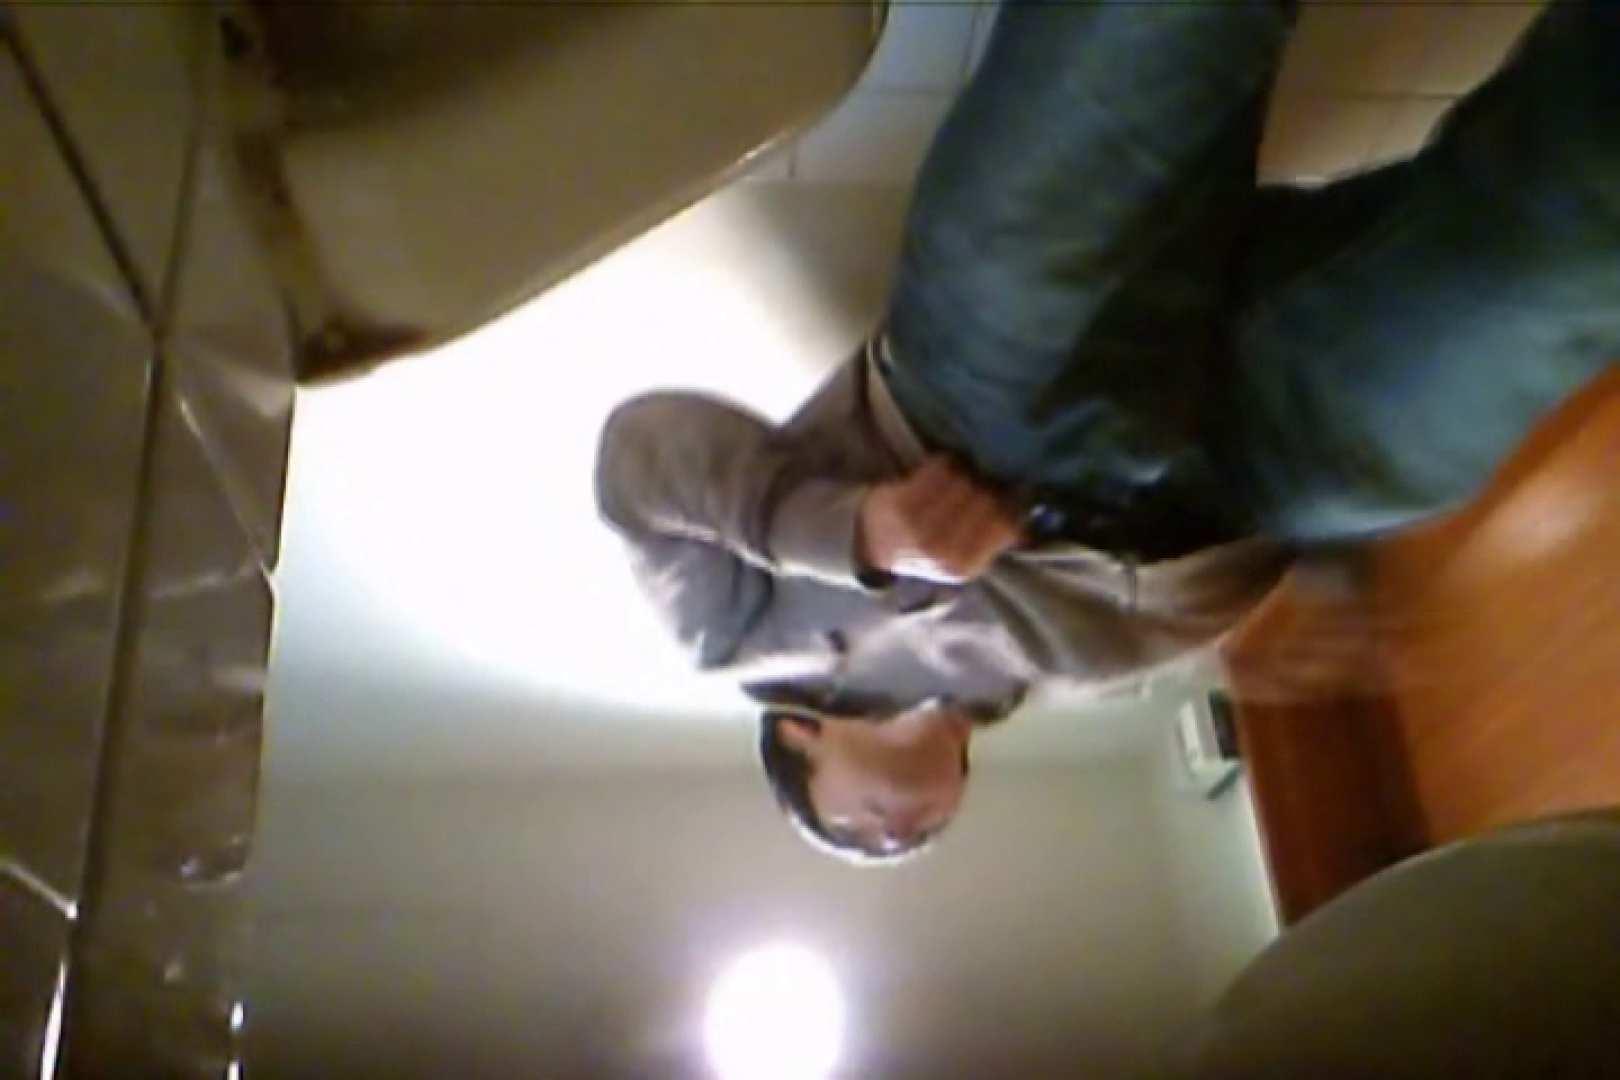 SEASON 2ND!掴み取りさんの洗面所覗き!in新幹線!VOL.03 スーツボーイズ | ボーイズ私服  76pic 55